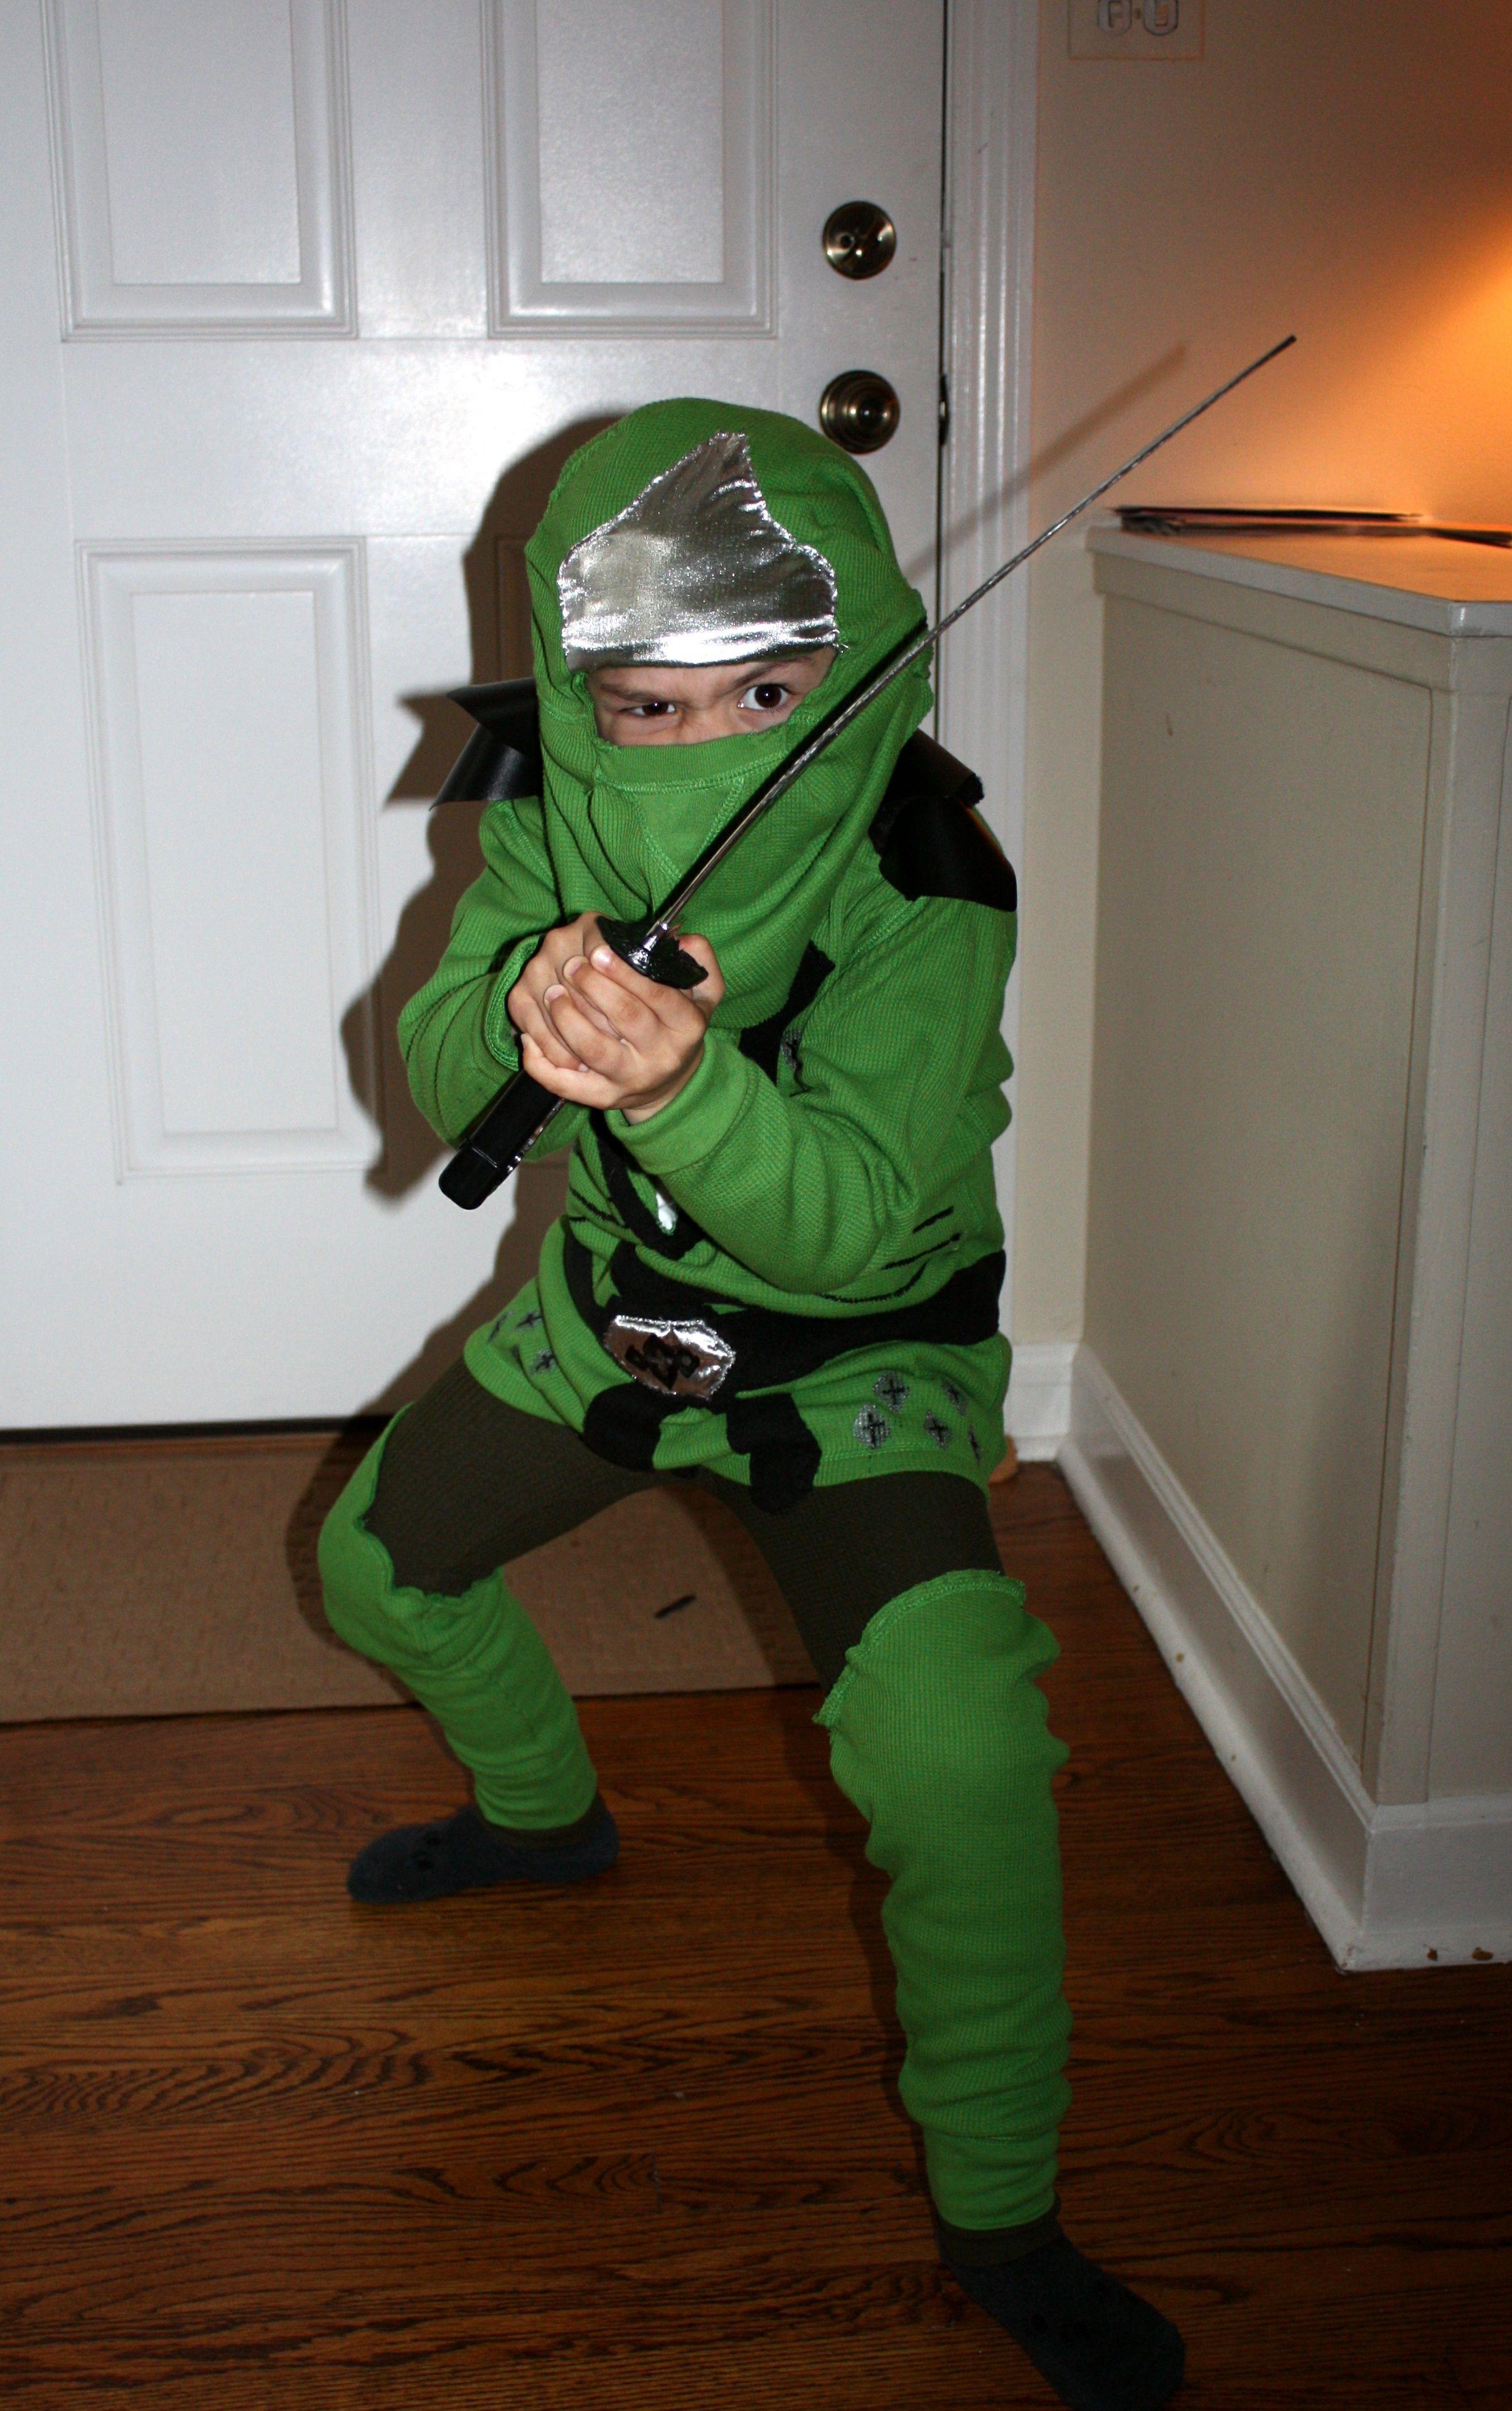 My little guy s homemade Lego Ninjago Halloween Costume  Green Ninja (Lloyd) dec9f53bbe2c3